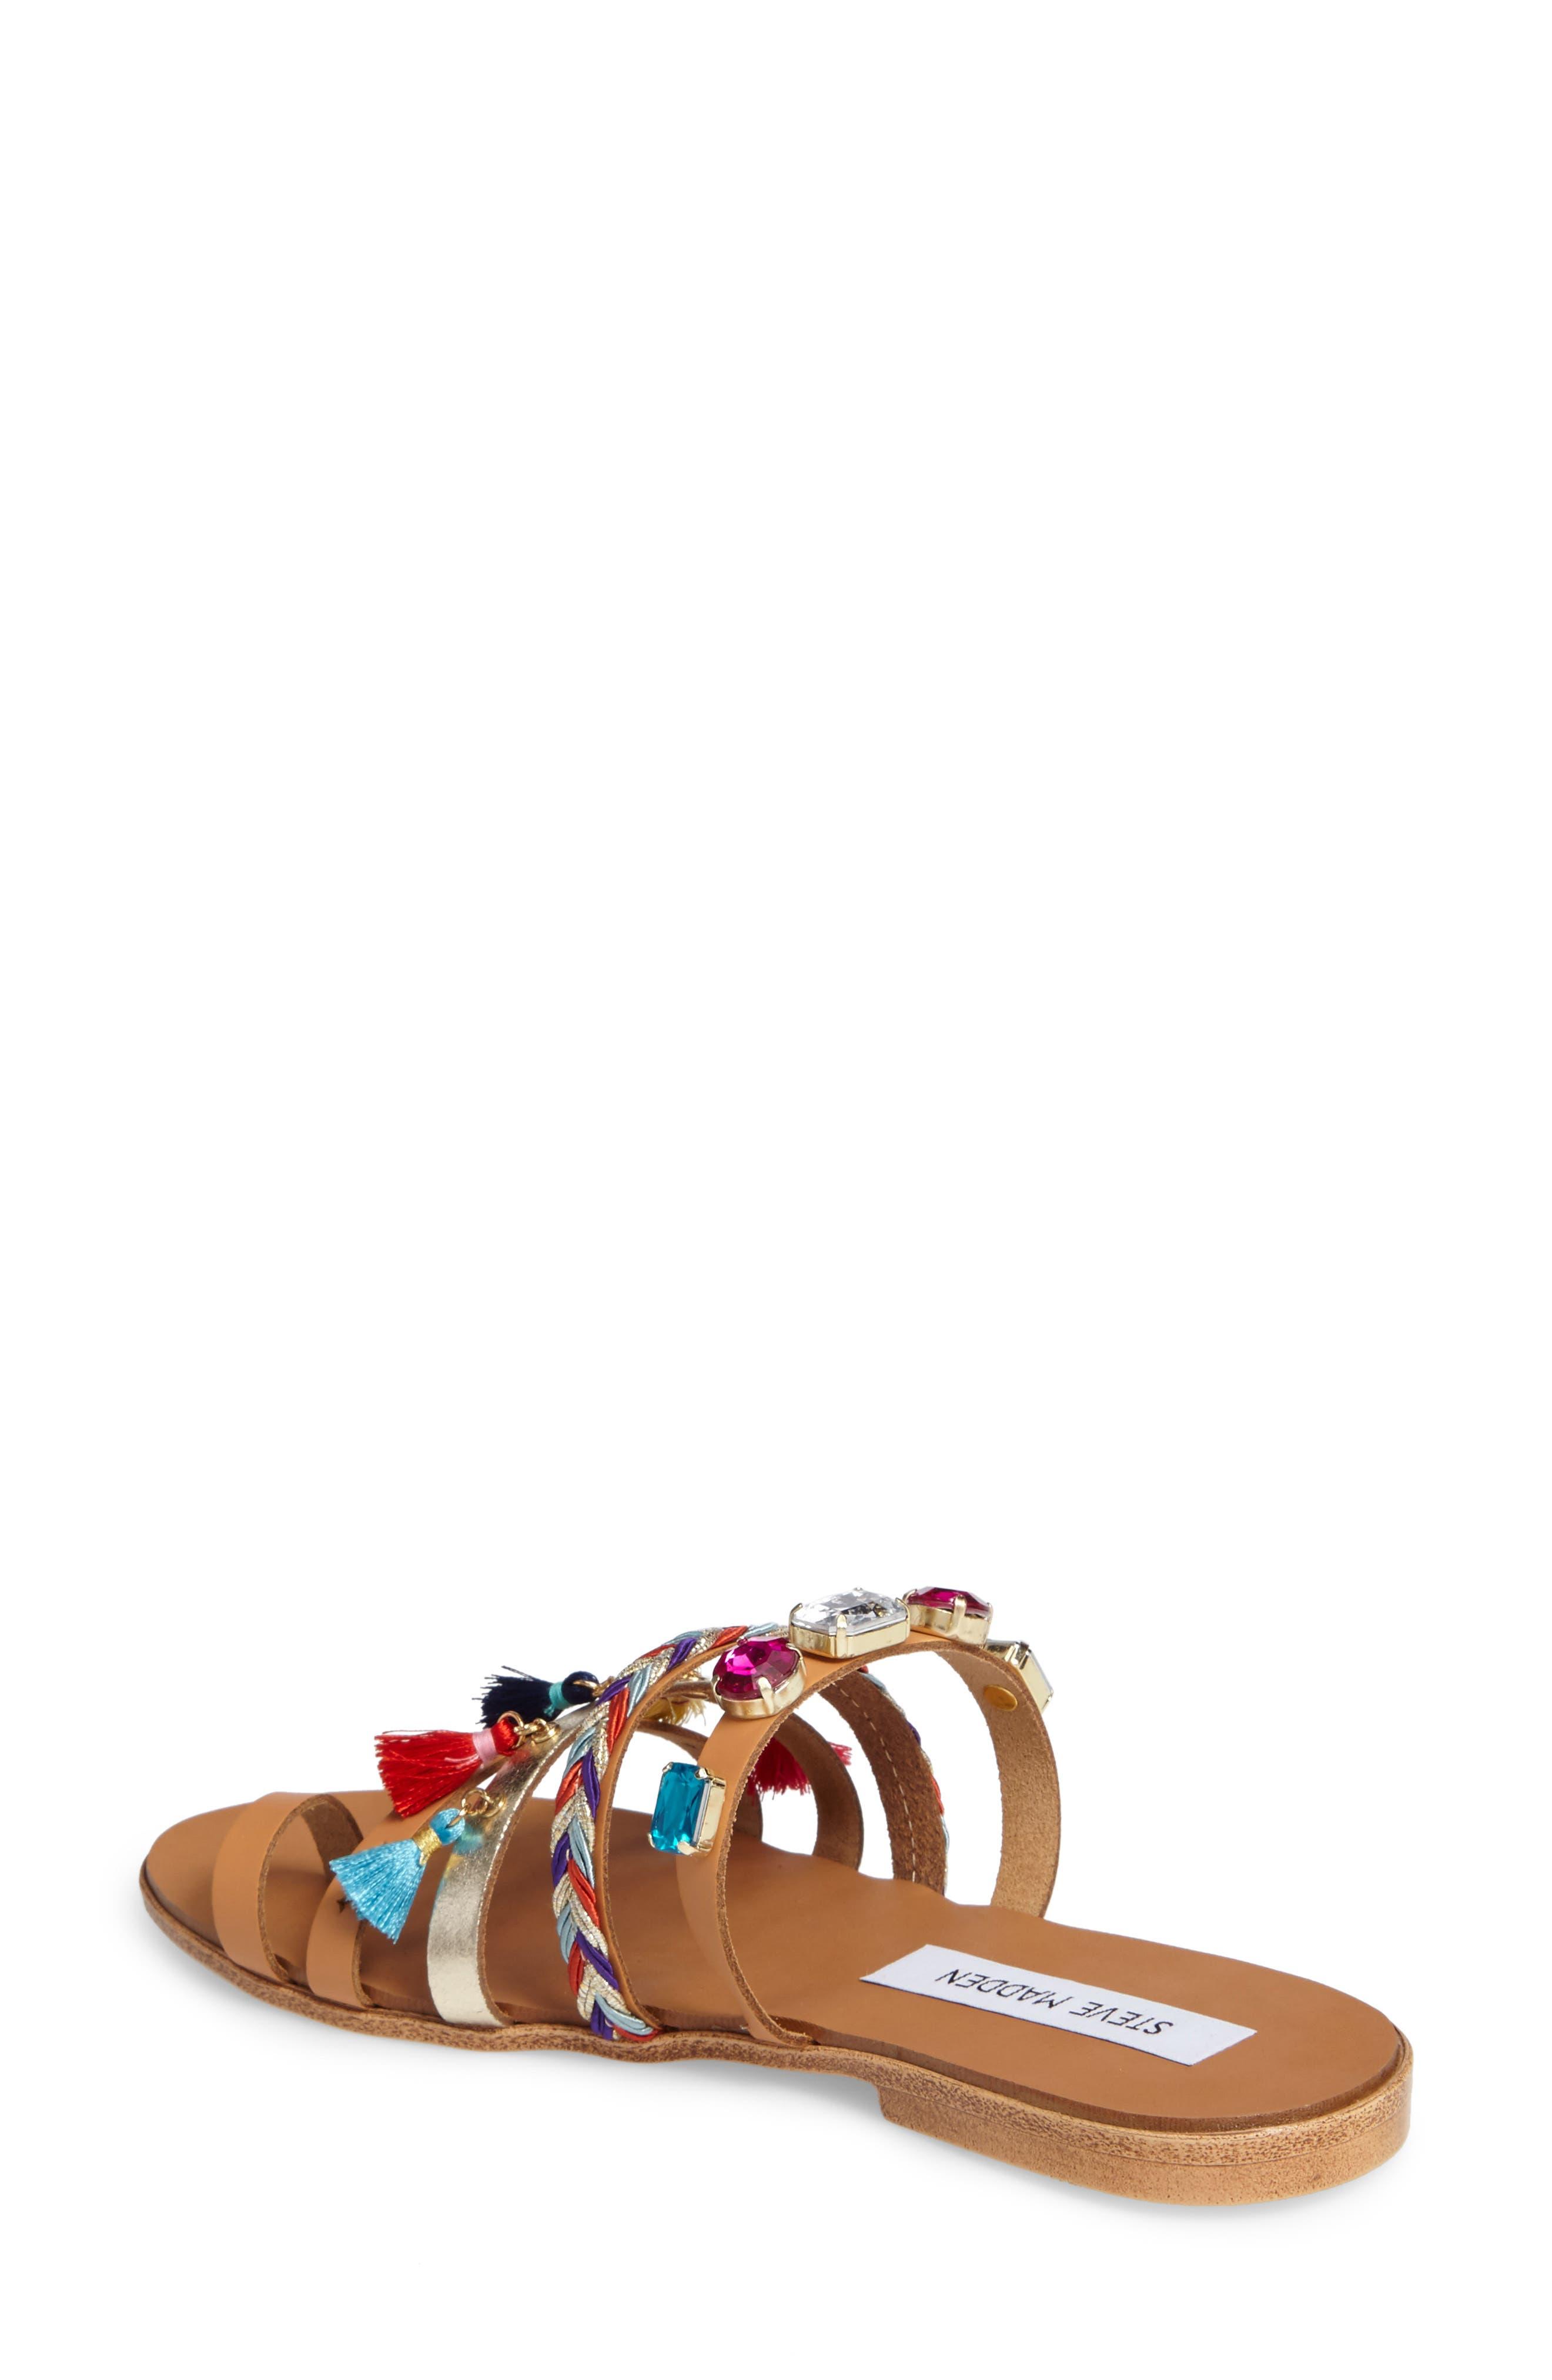 Cary Embellished Sandal,                             Alternate thumbnail 2, color,                             200